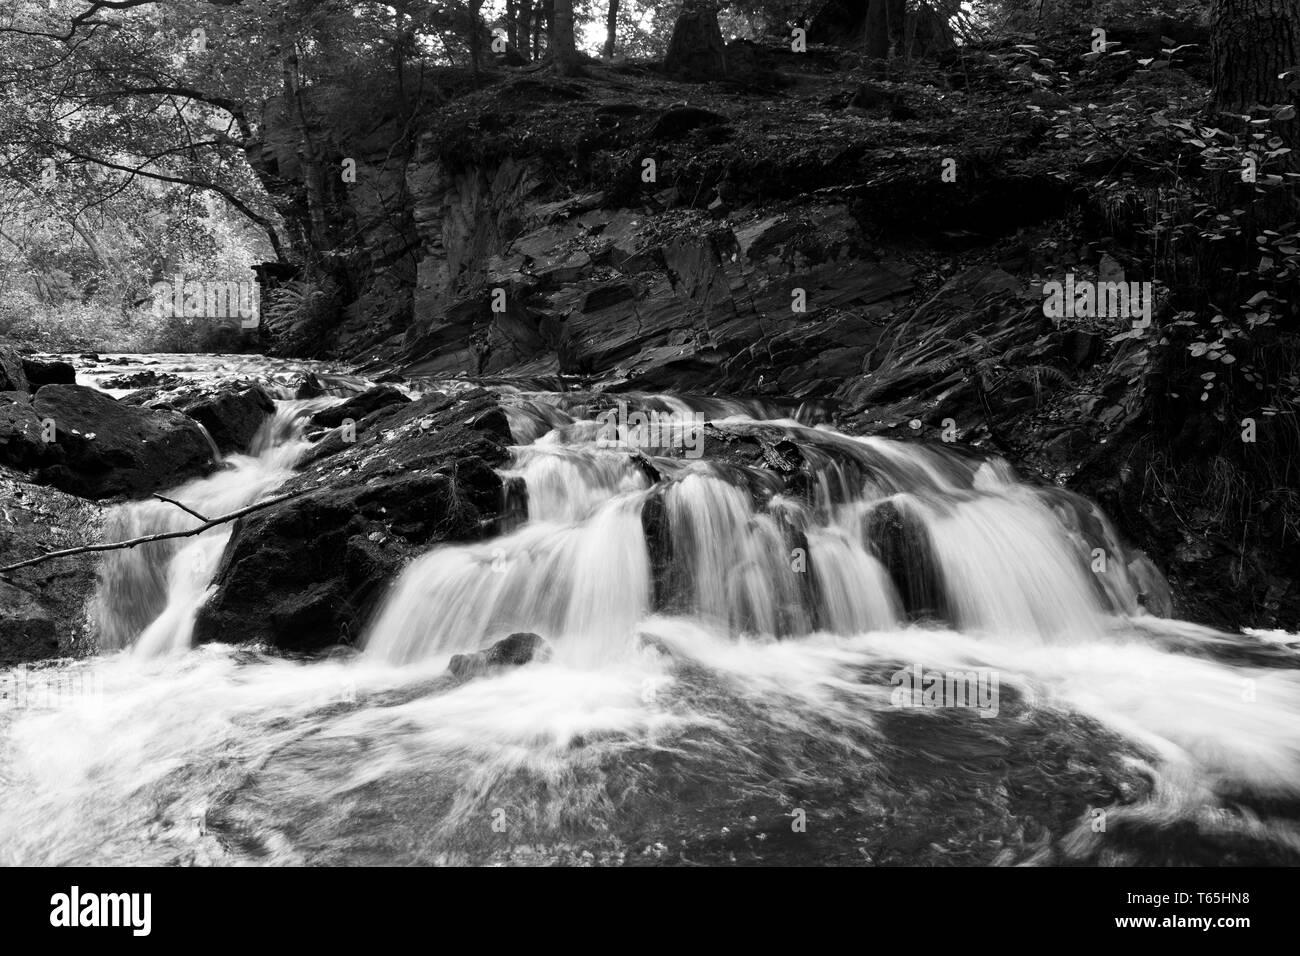 Stream Selke, Harz Mountains, Germany - Stock Image